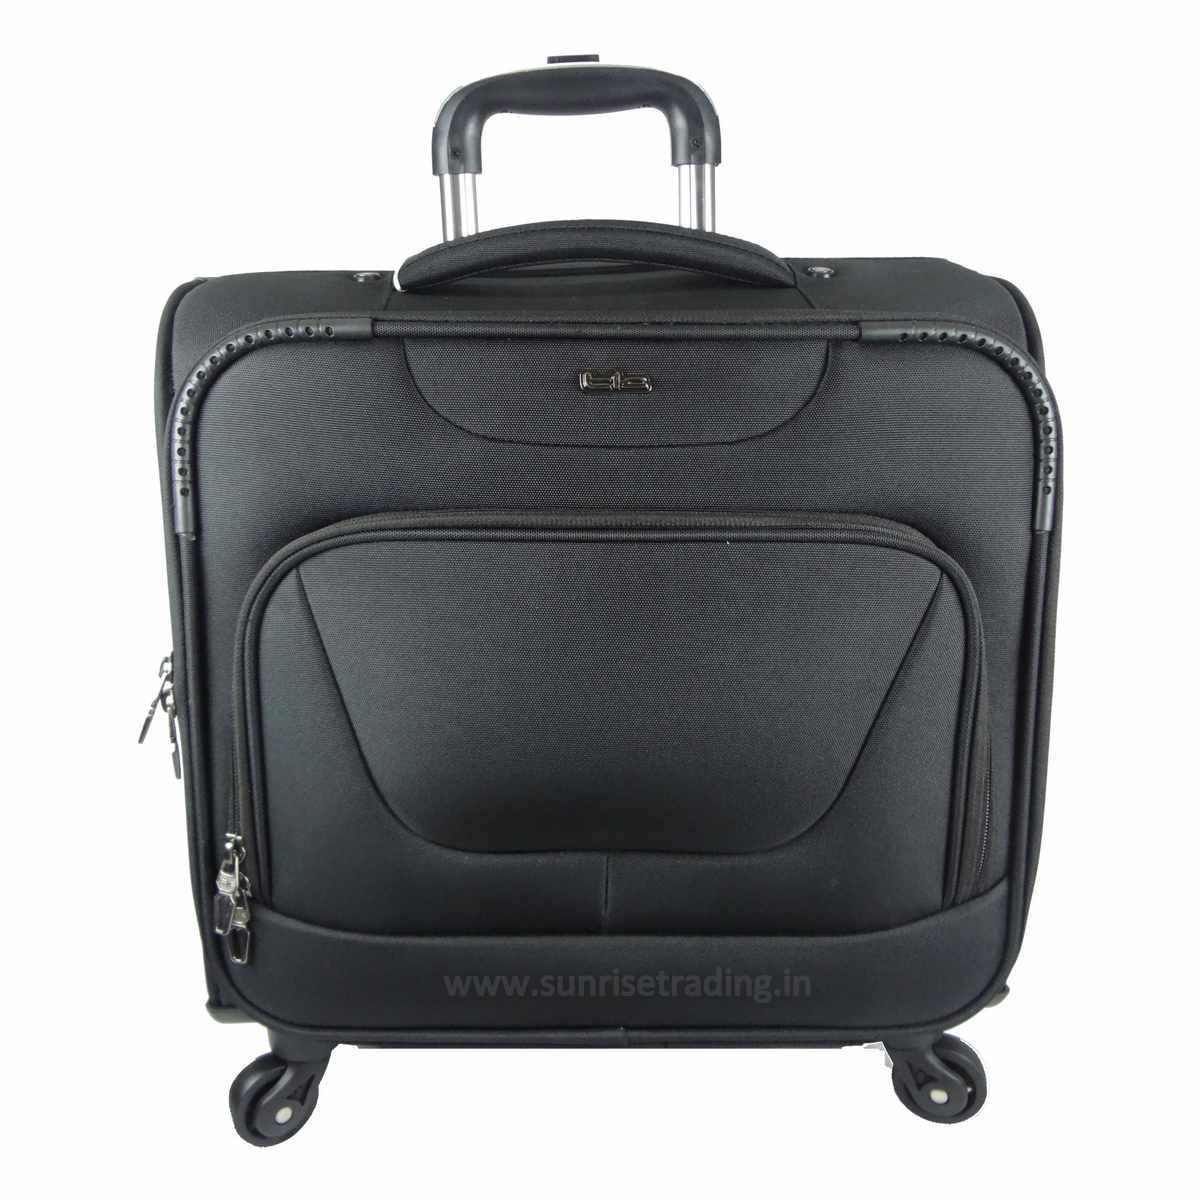 51d737ae44f TLC Ovi Laptop Overnighter Trolley Bag - Sunrise Trading Co (Bangalore)